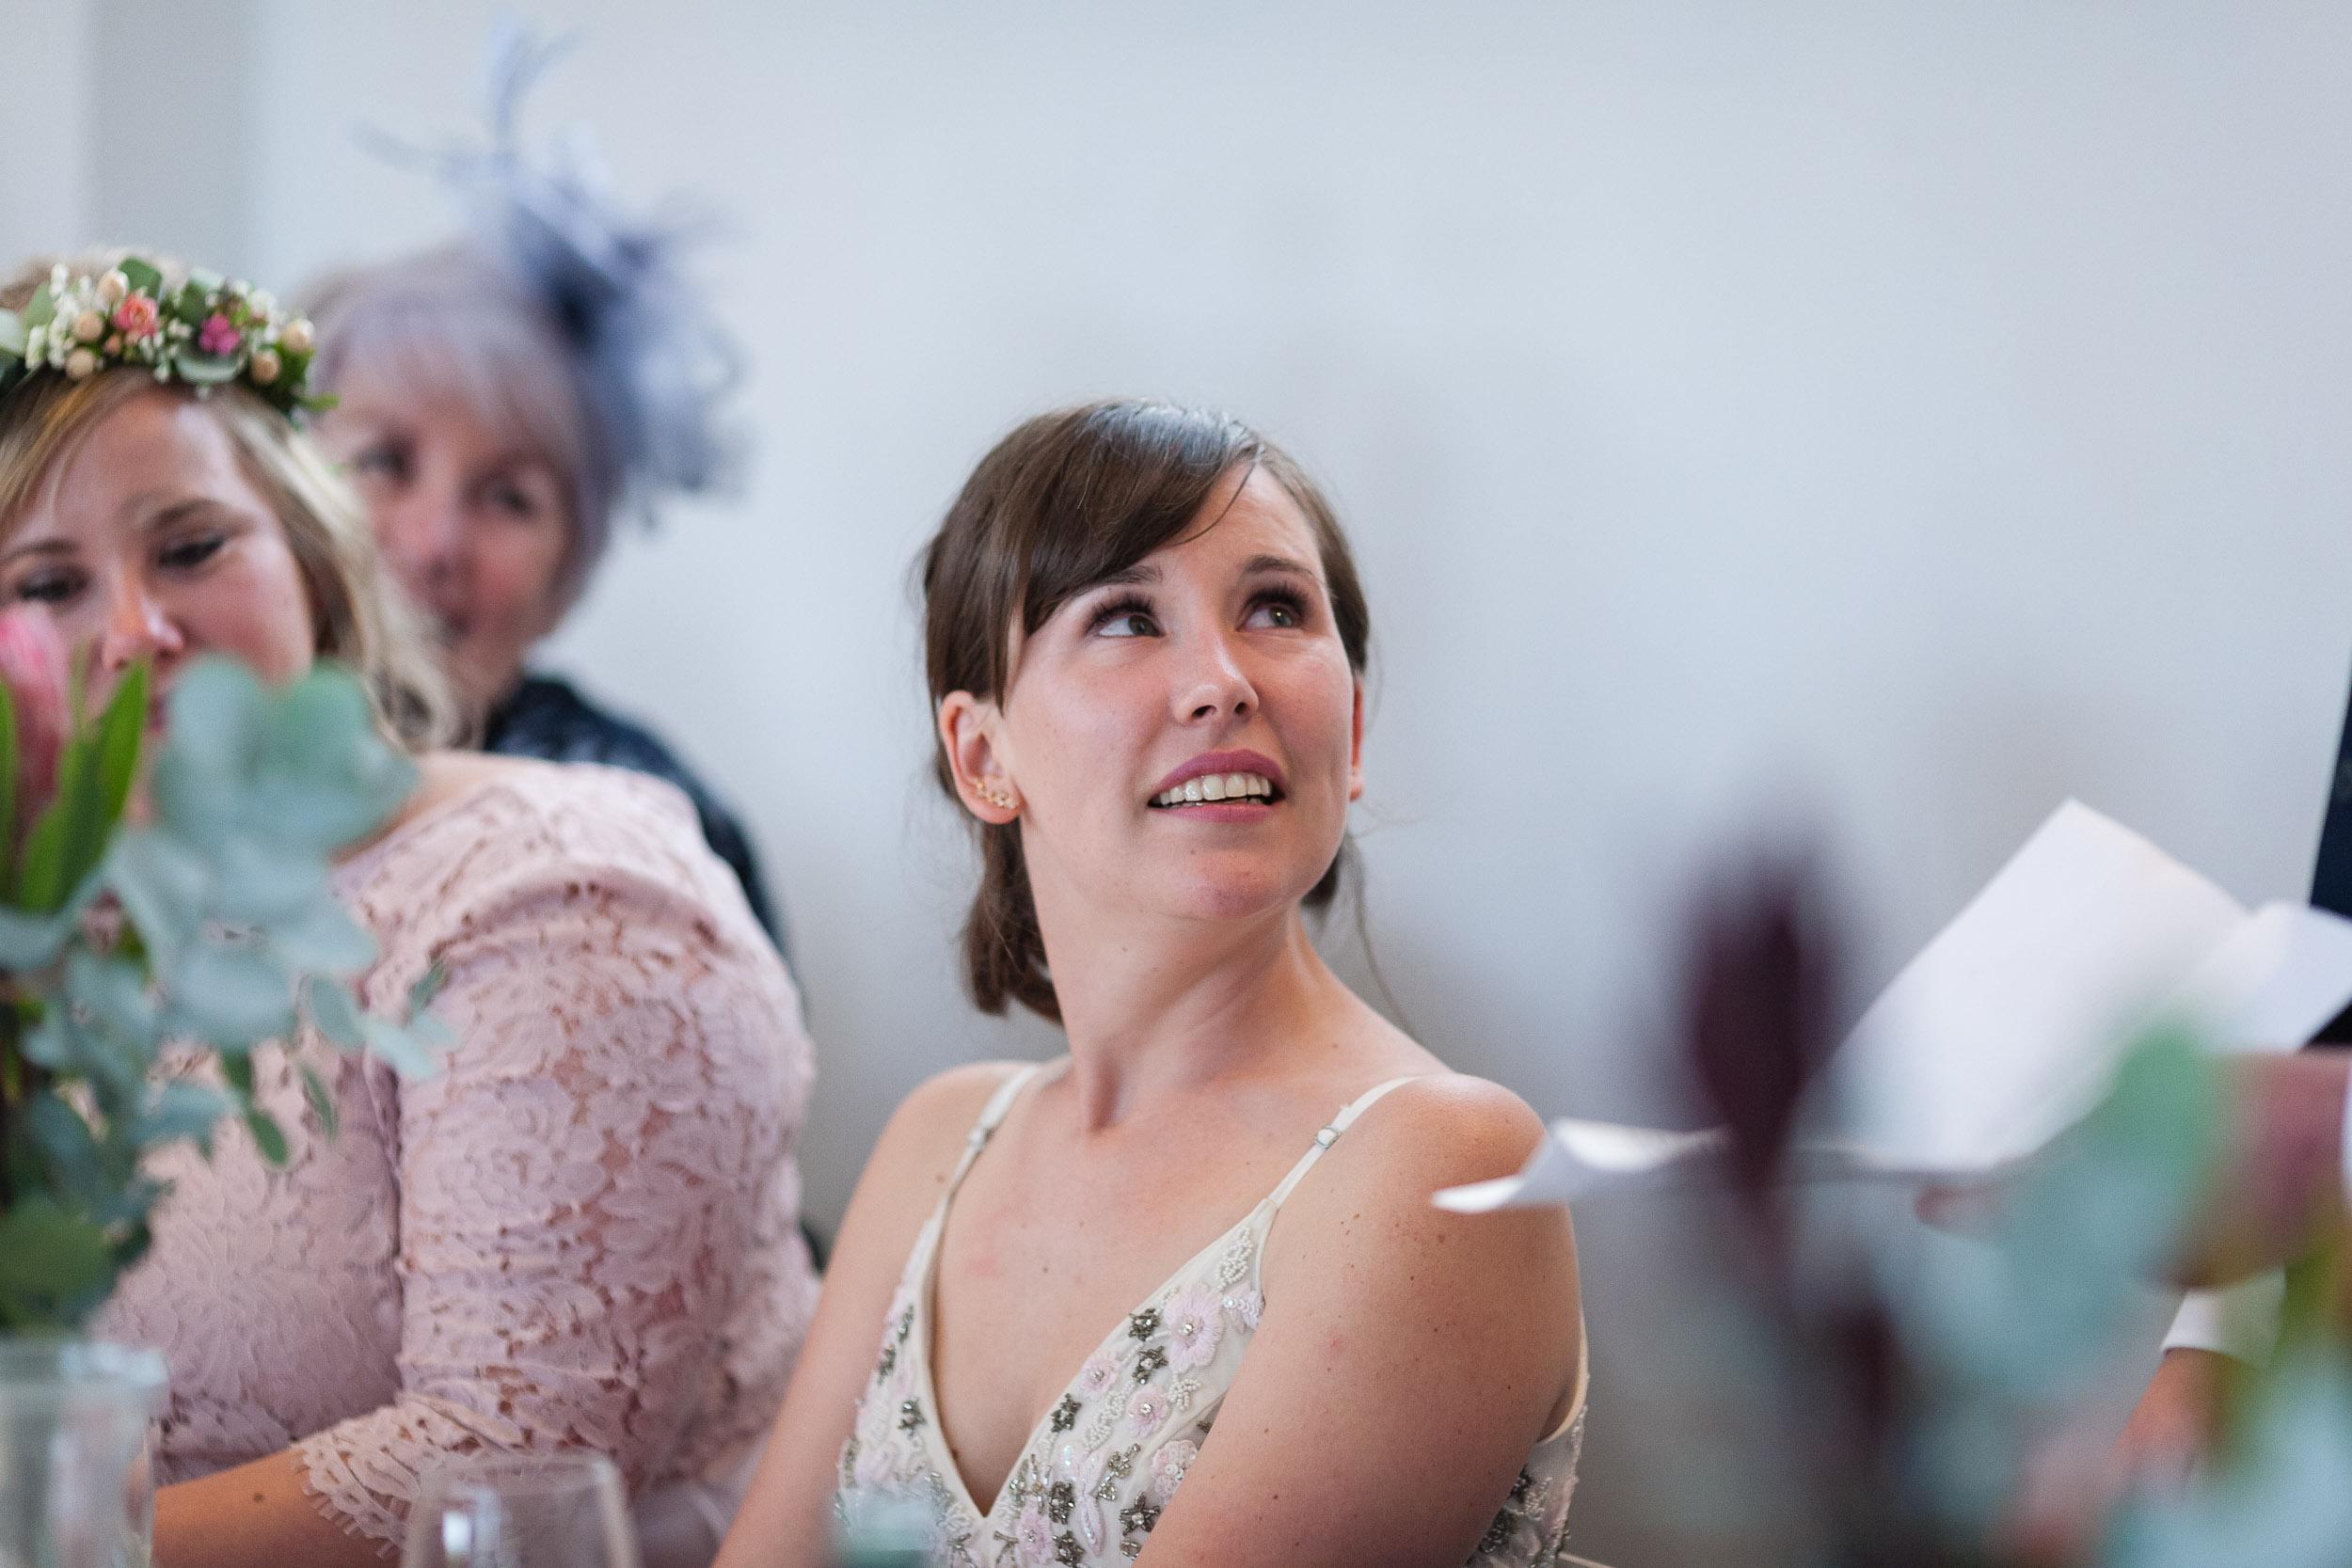 brockwell-lido-brixton-herne-hill-wedding-352.jpg